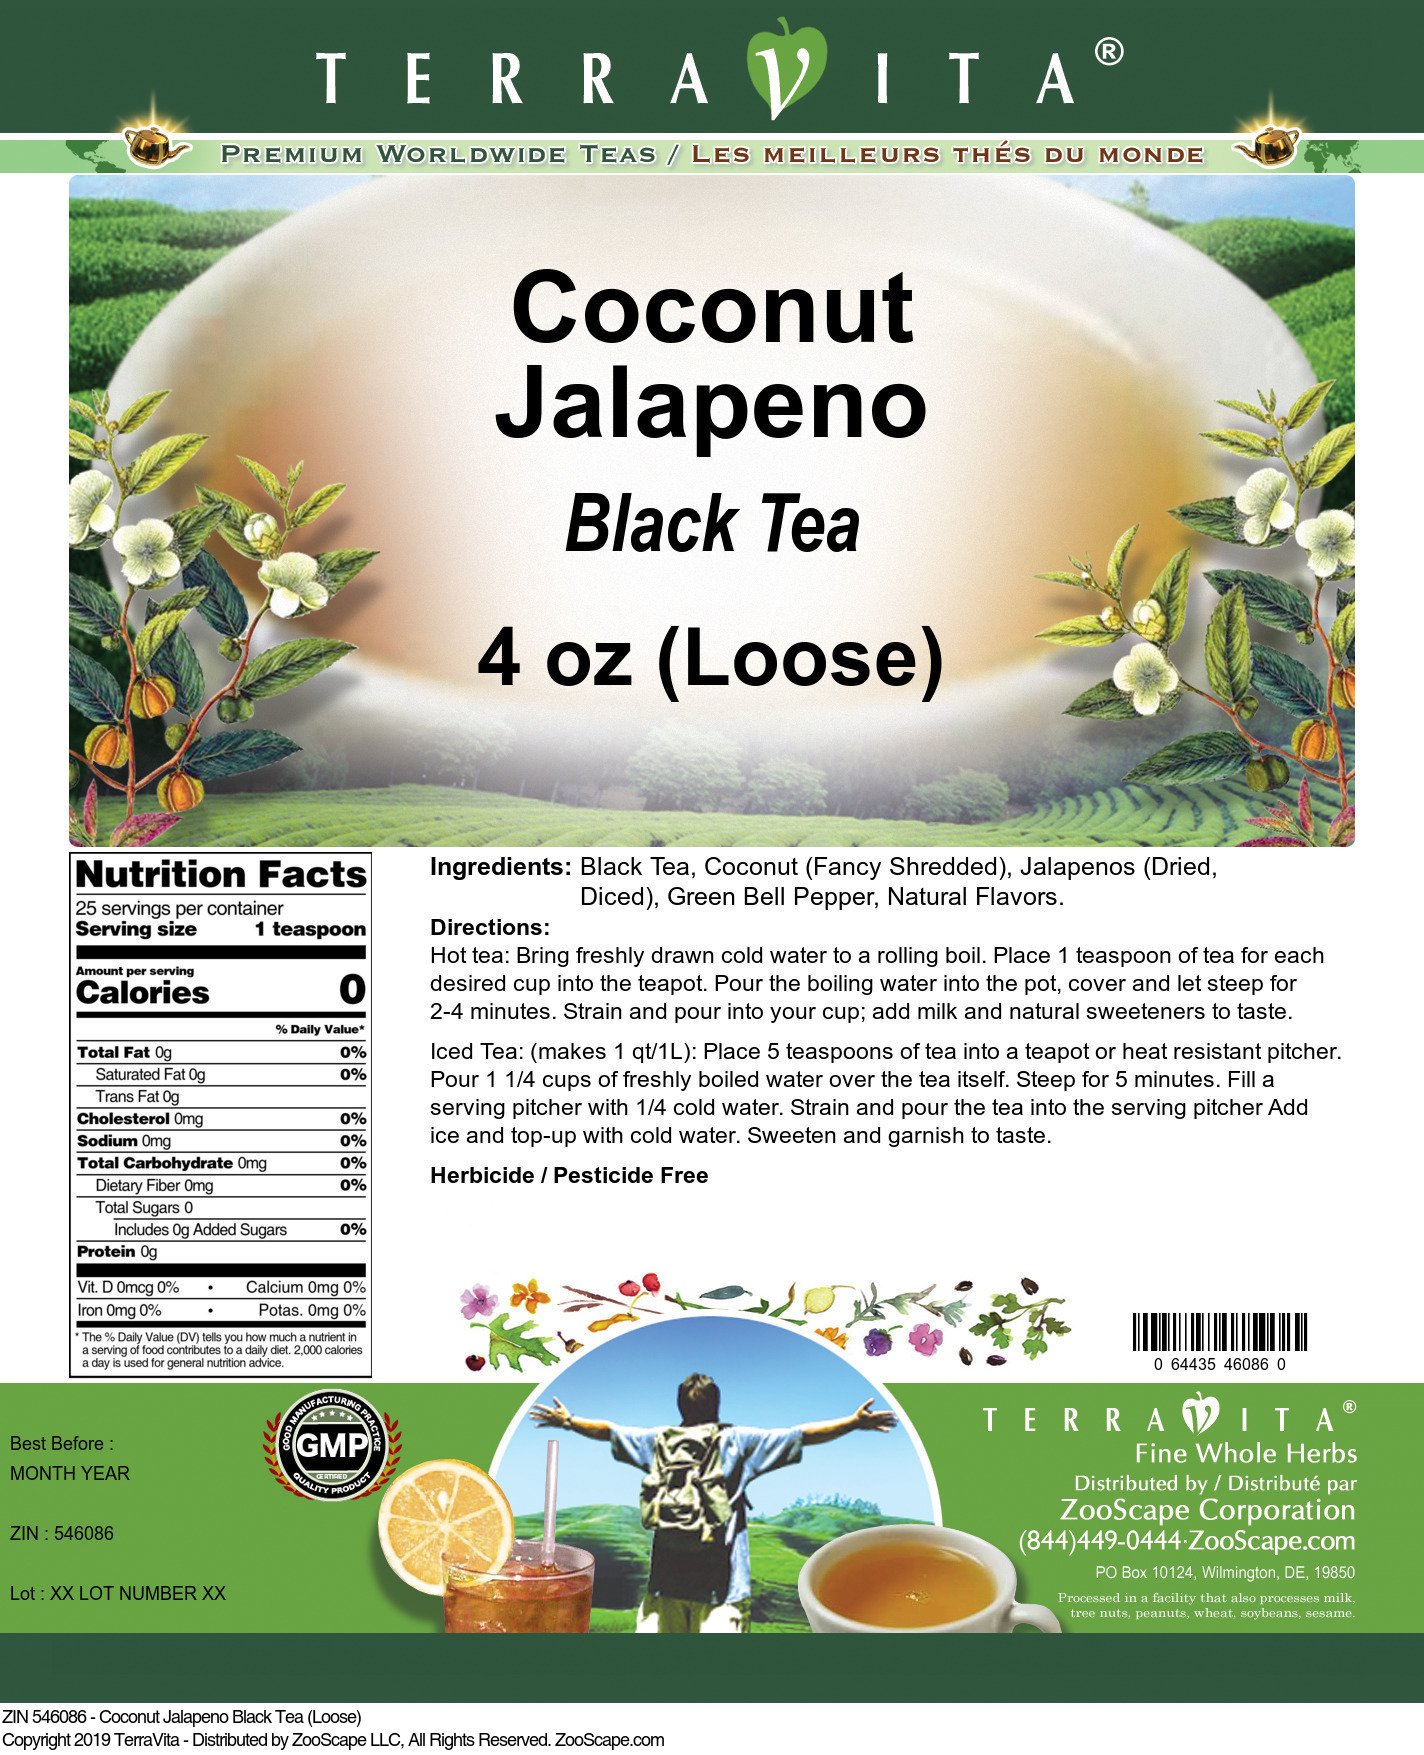 Coconut Jalapeno Black Tea (Loose)